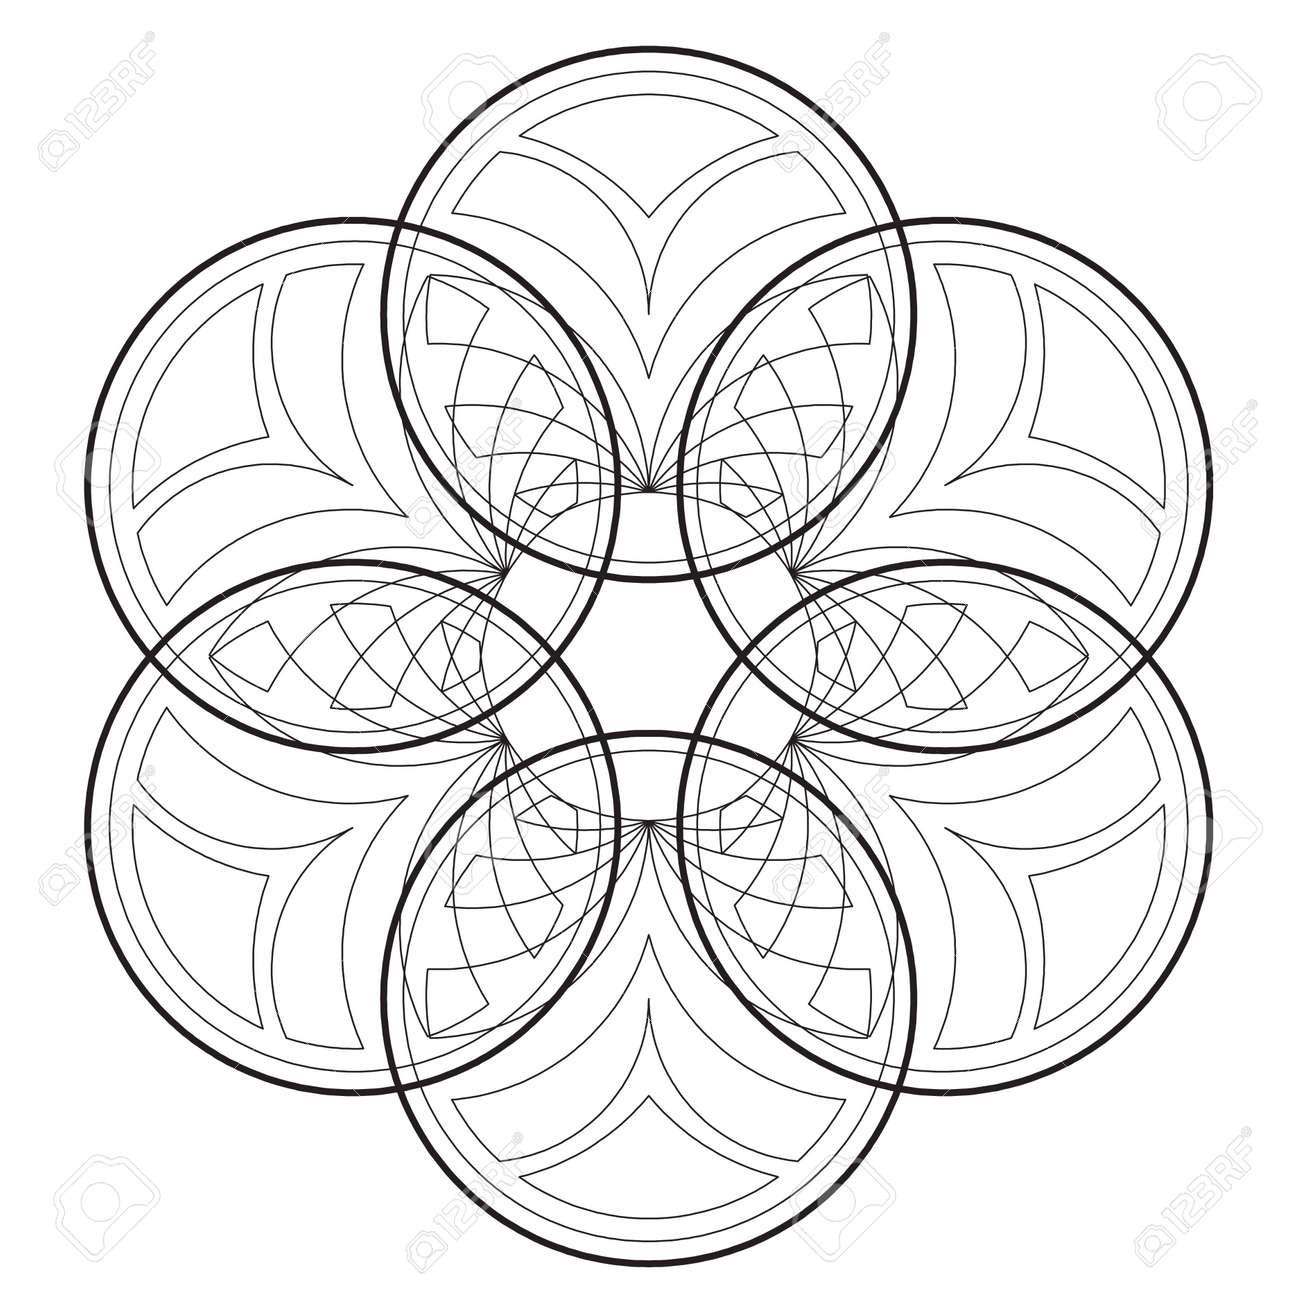 Coloring madalas. adult coloring . madalas coloring on white background. Mandalas art therapy & healing. - 151773690